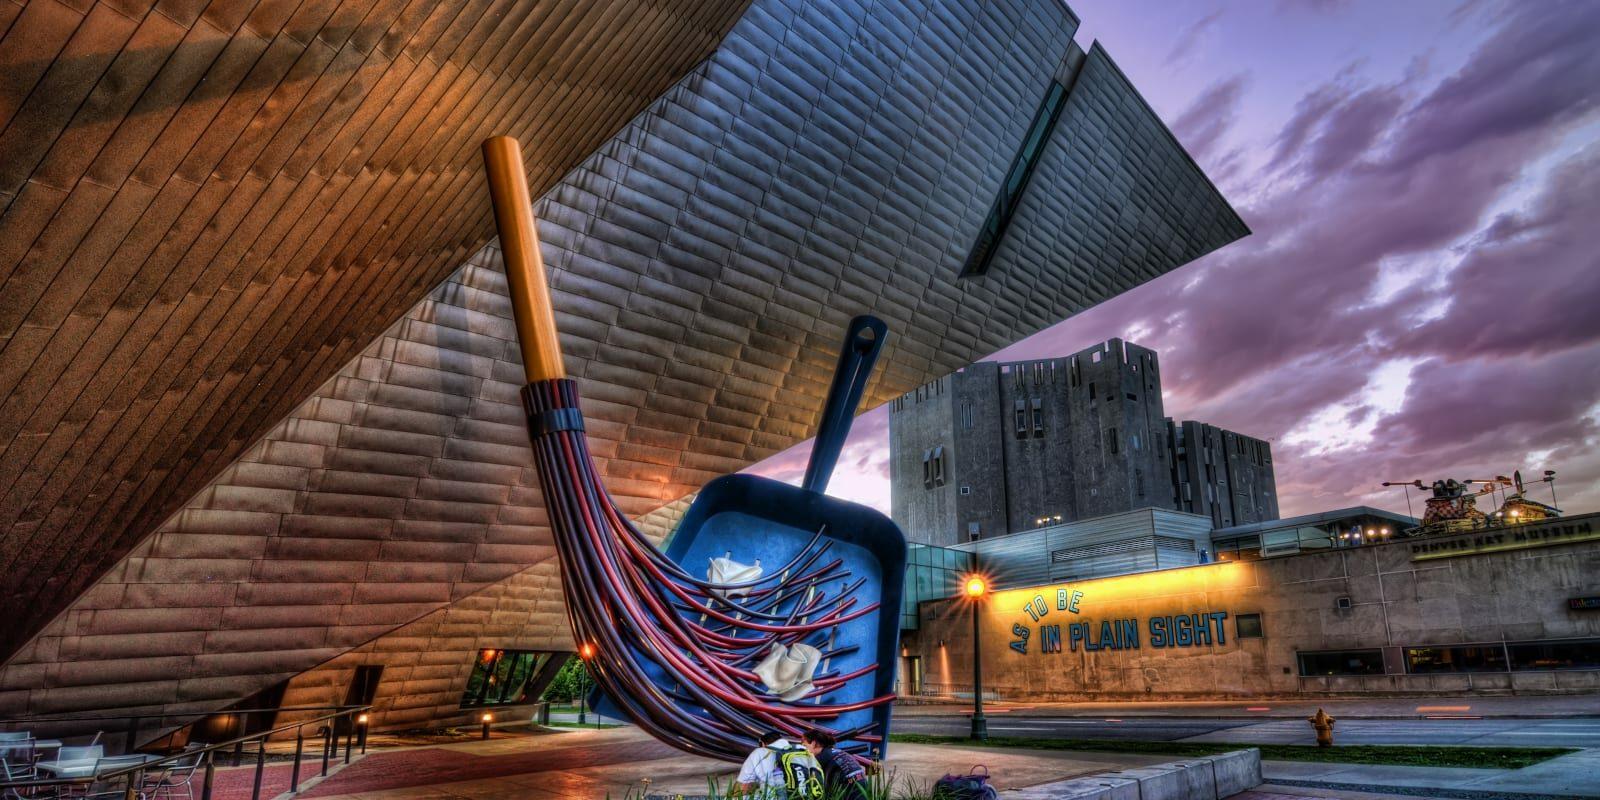 Best Culture Attractions Denver Art Museum Sculptures